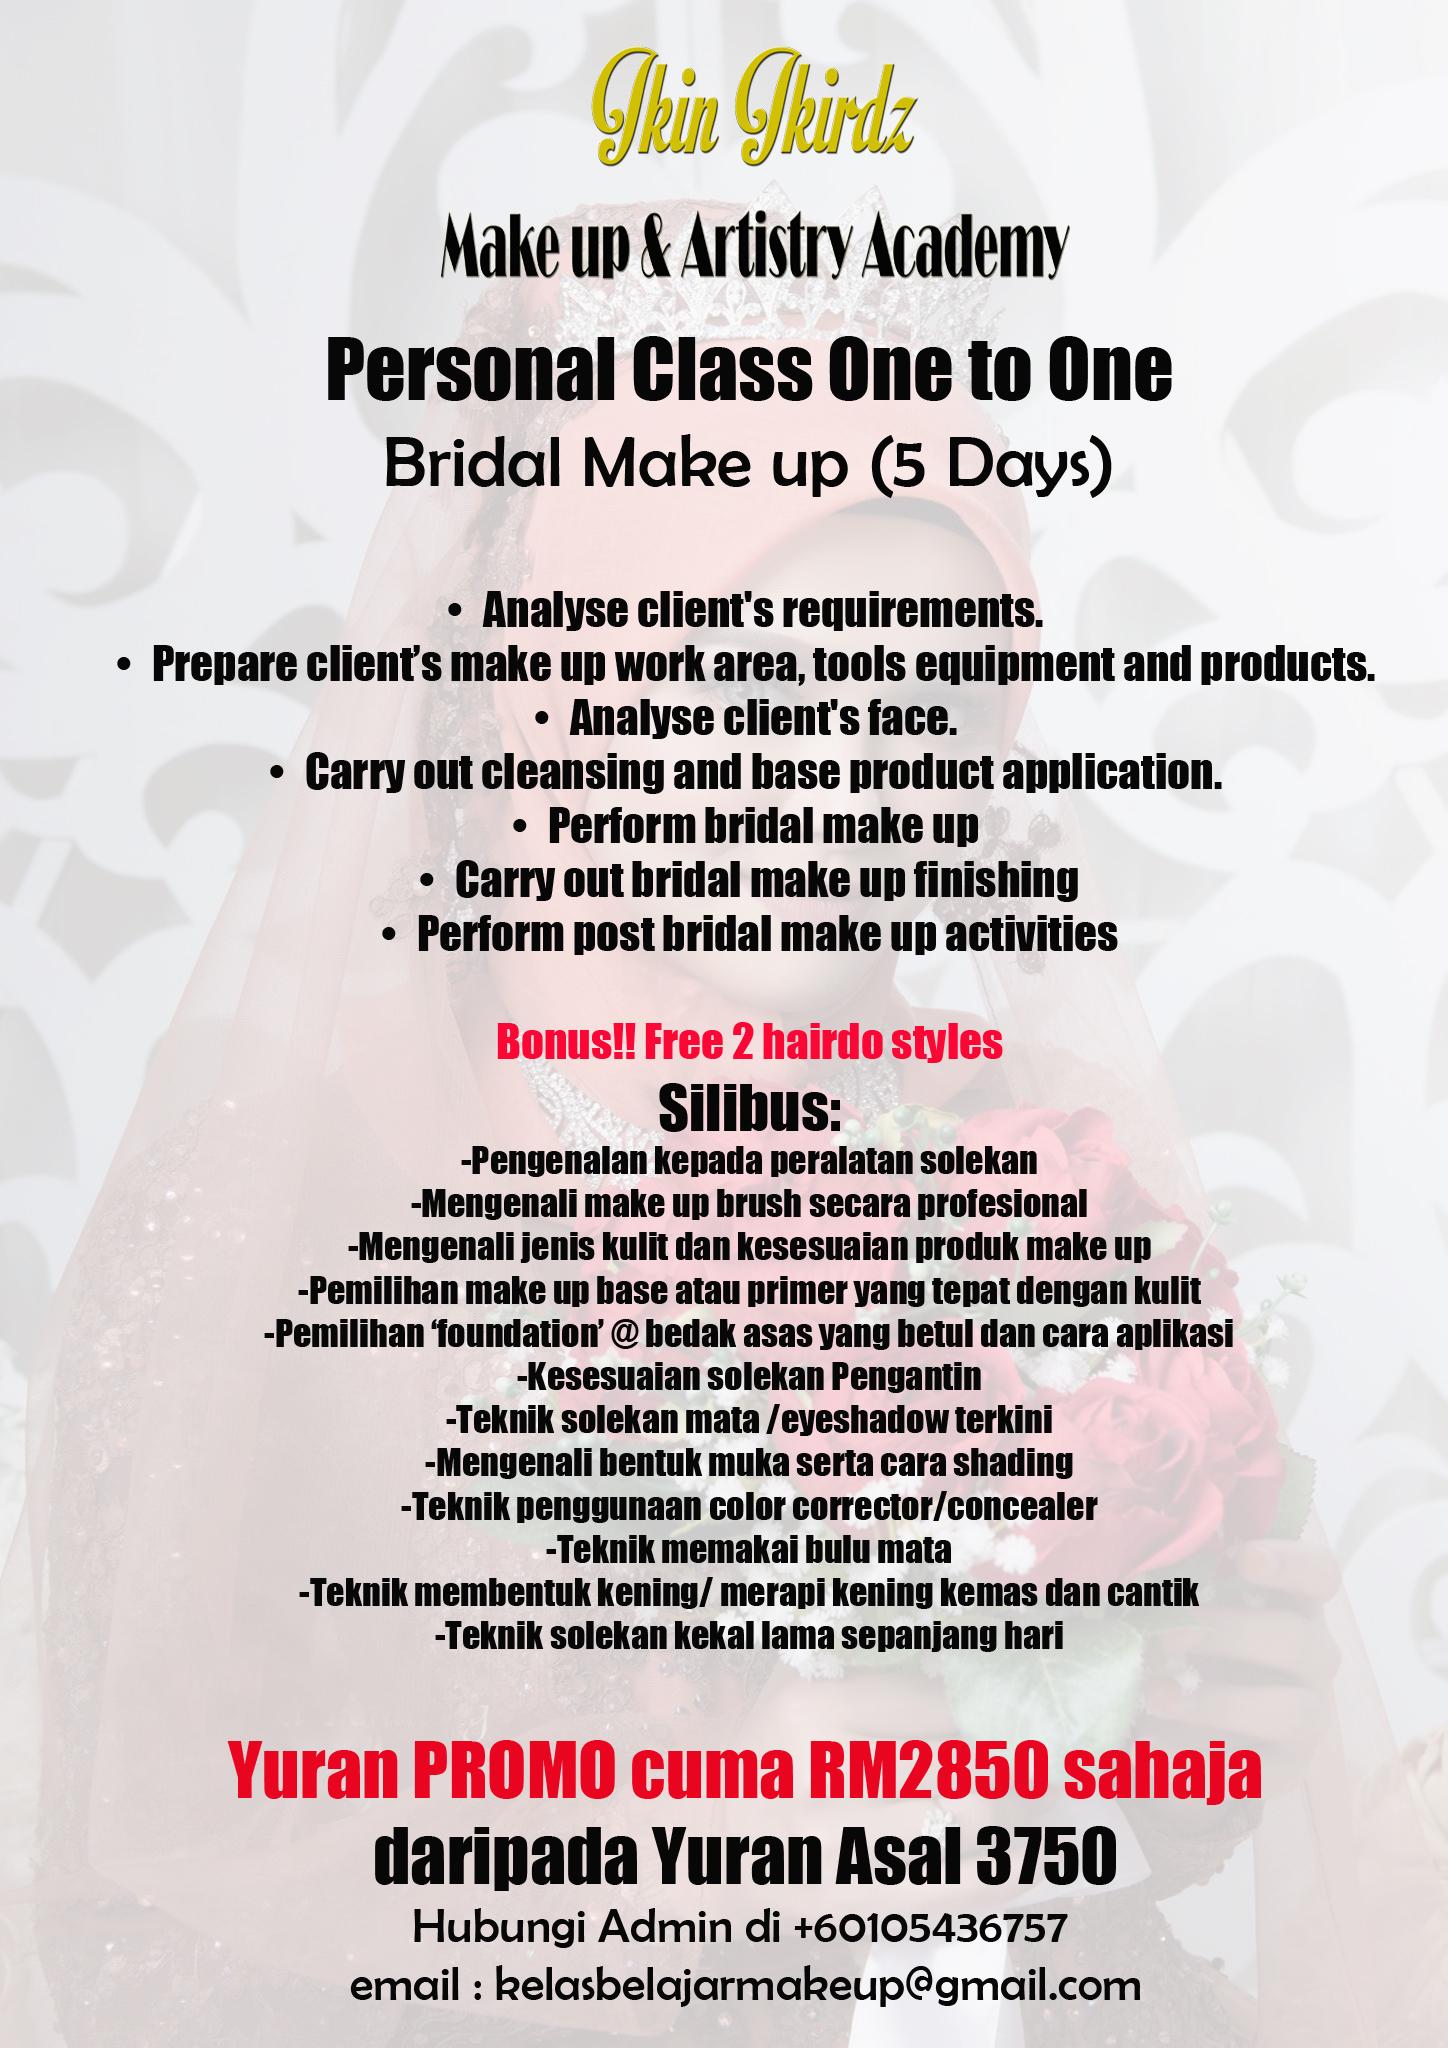 personal class murah make up pengantin pakej 5 hari